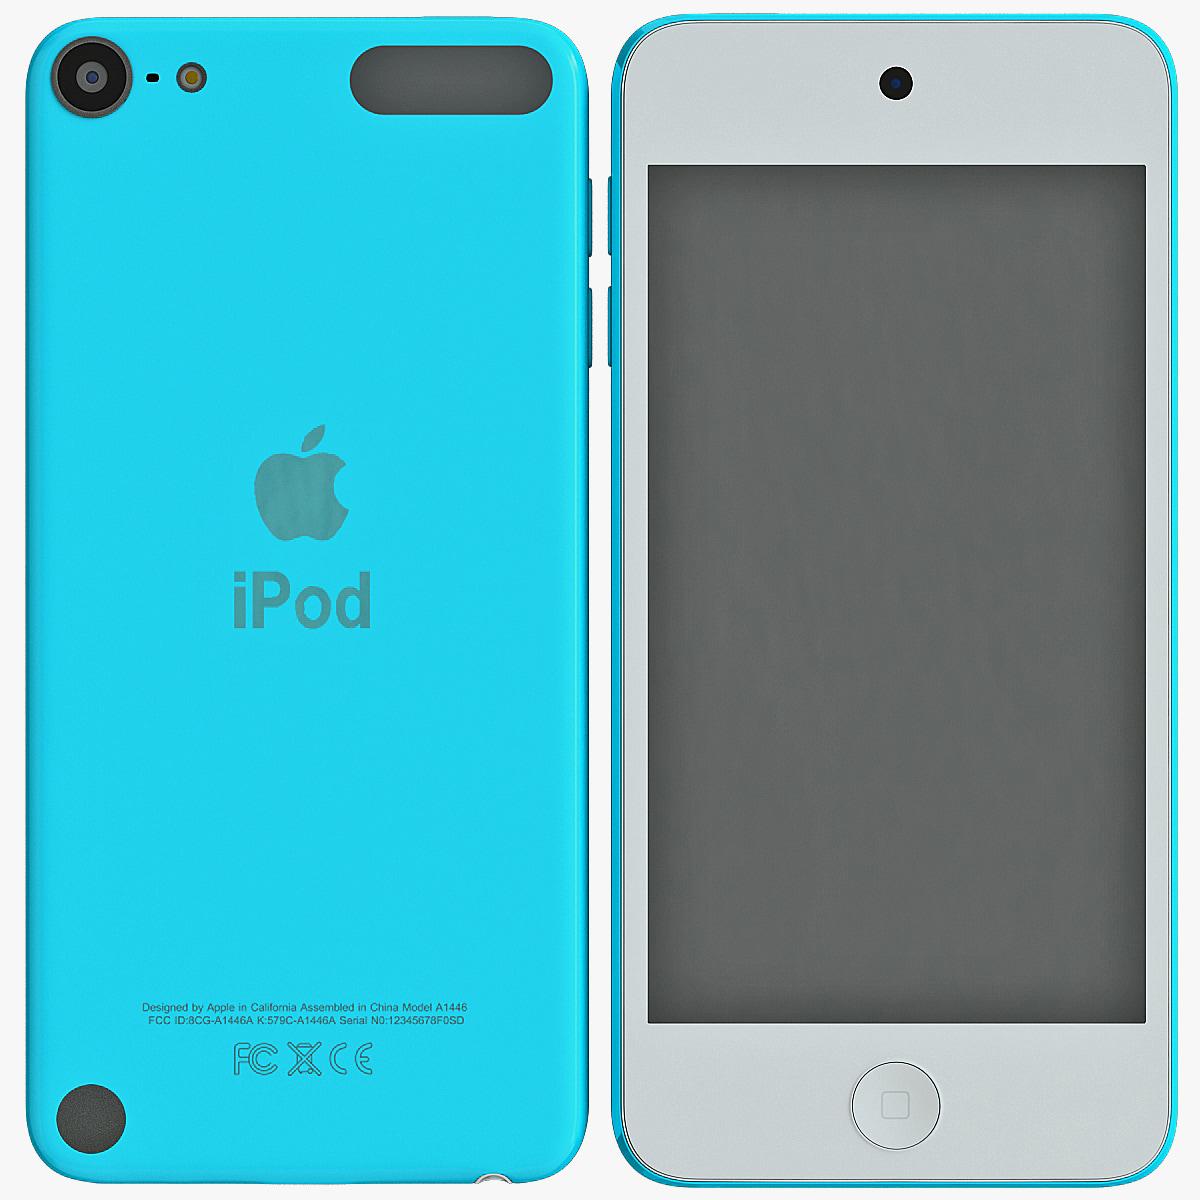 Ipod_Nano_Generation_5th_Blue_000.jpg